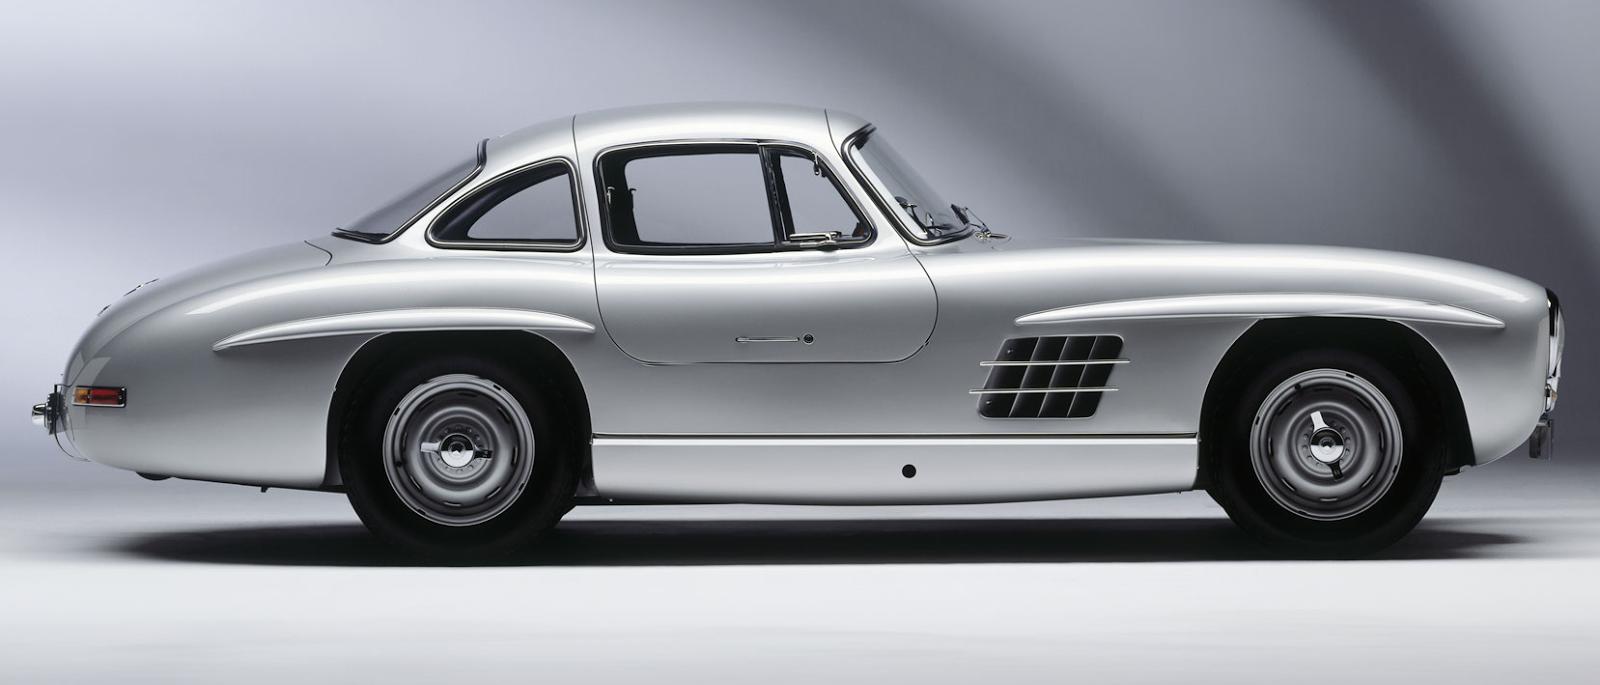 Supercarworld 1954 mercedes benz 300 sl gullwing coupe for Mercedes benz sl 300